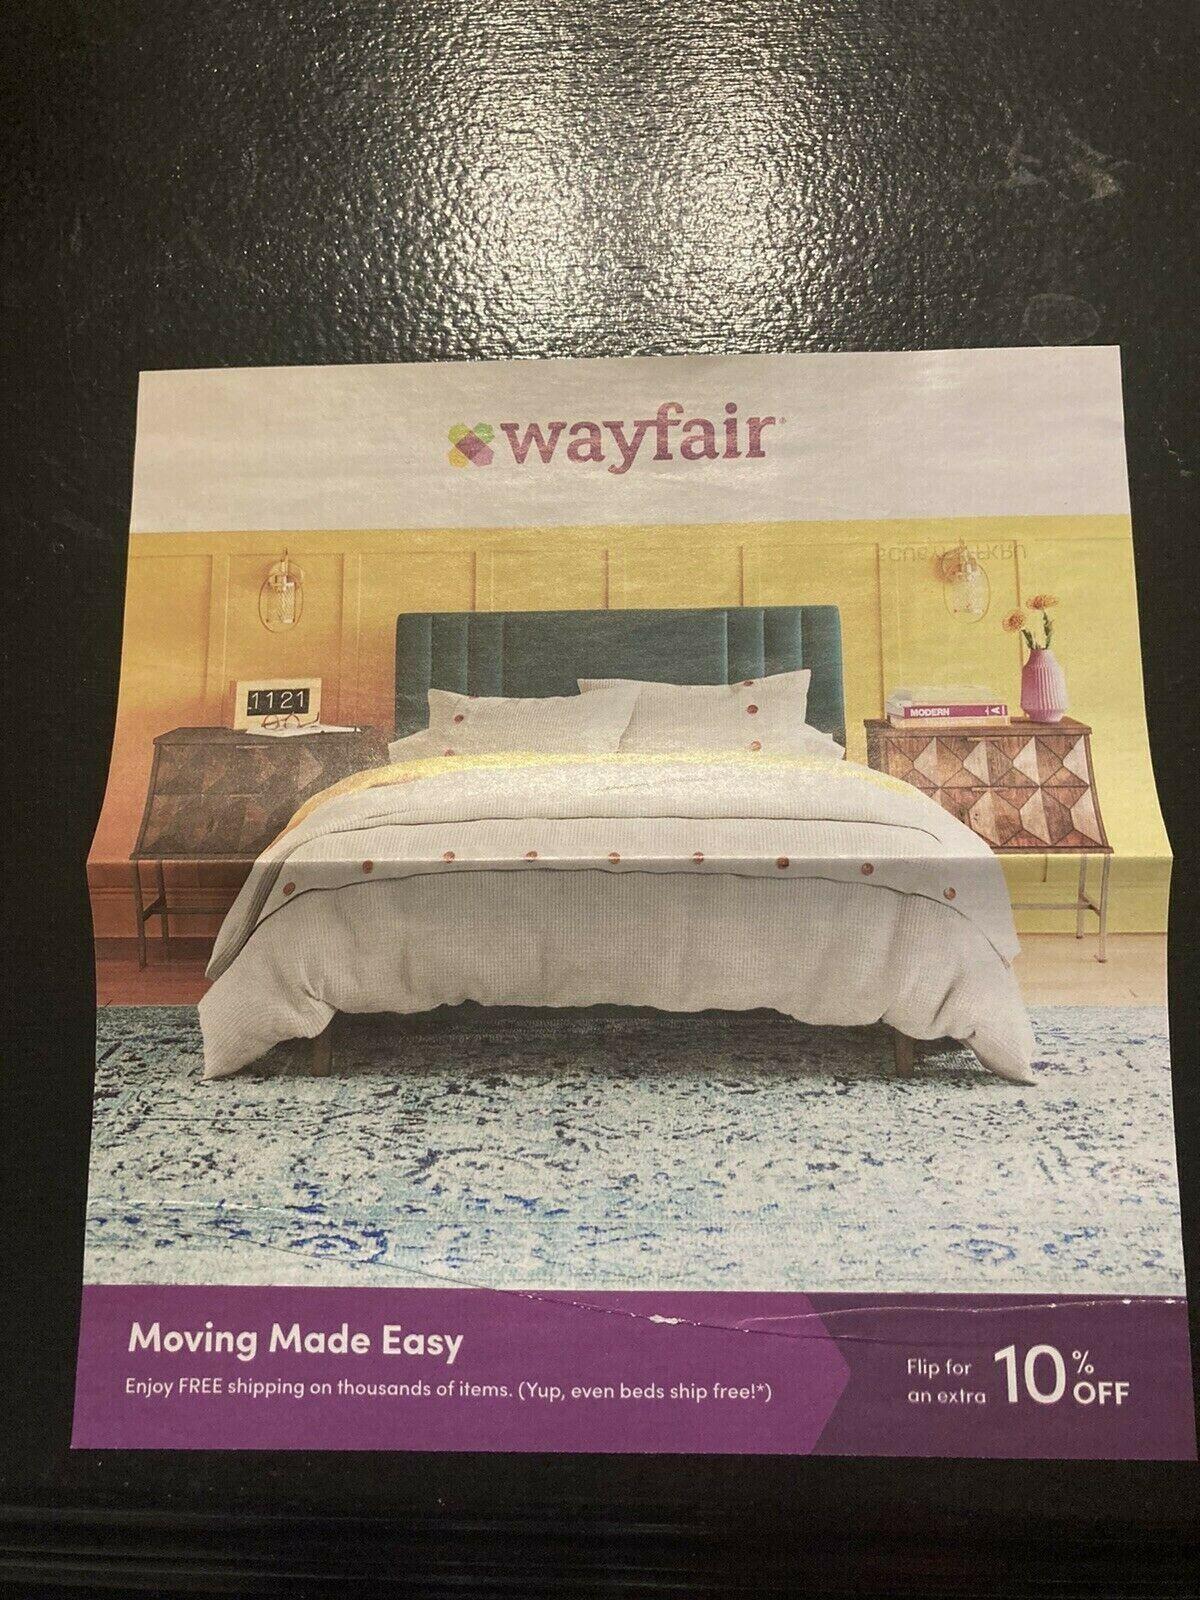 WAYFAIR.com Discount/Coupon Code 10 Off Your First Order - EXPIRES 7/2/2021 - $4.99